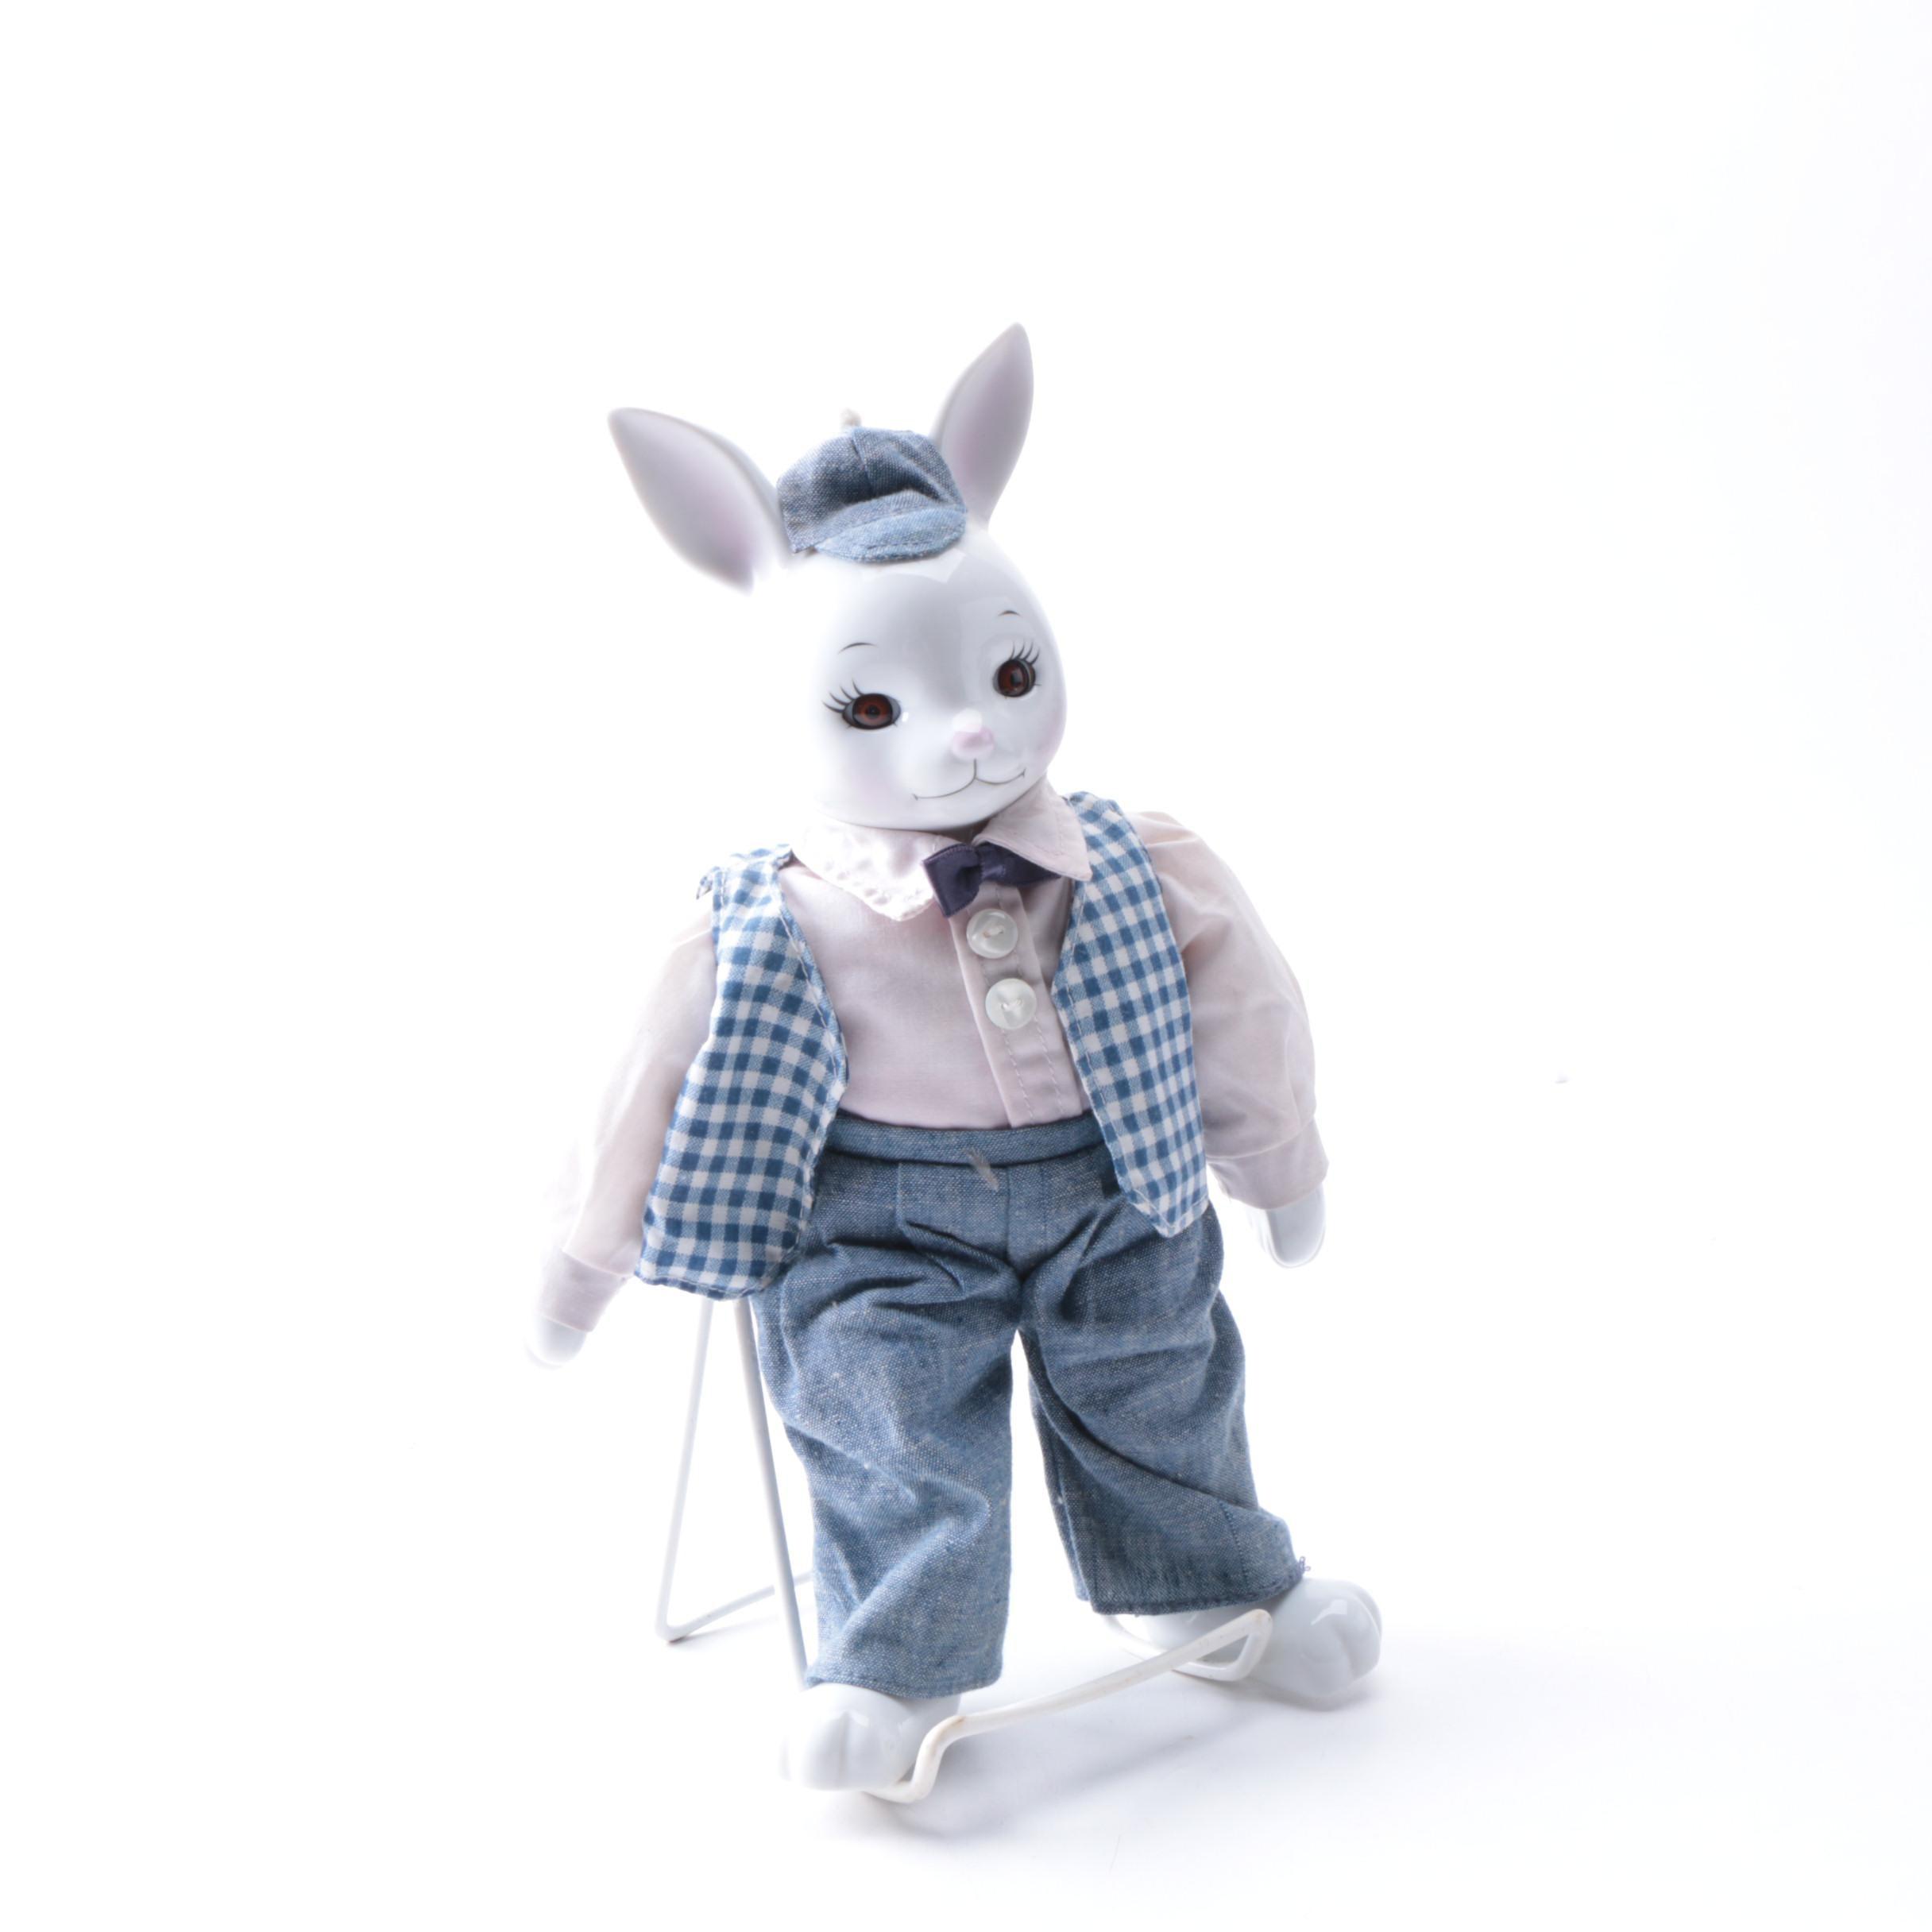 Ceramic and Cloth Rabbit Doll